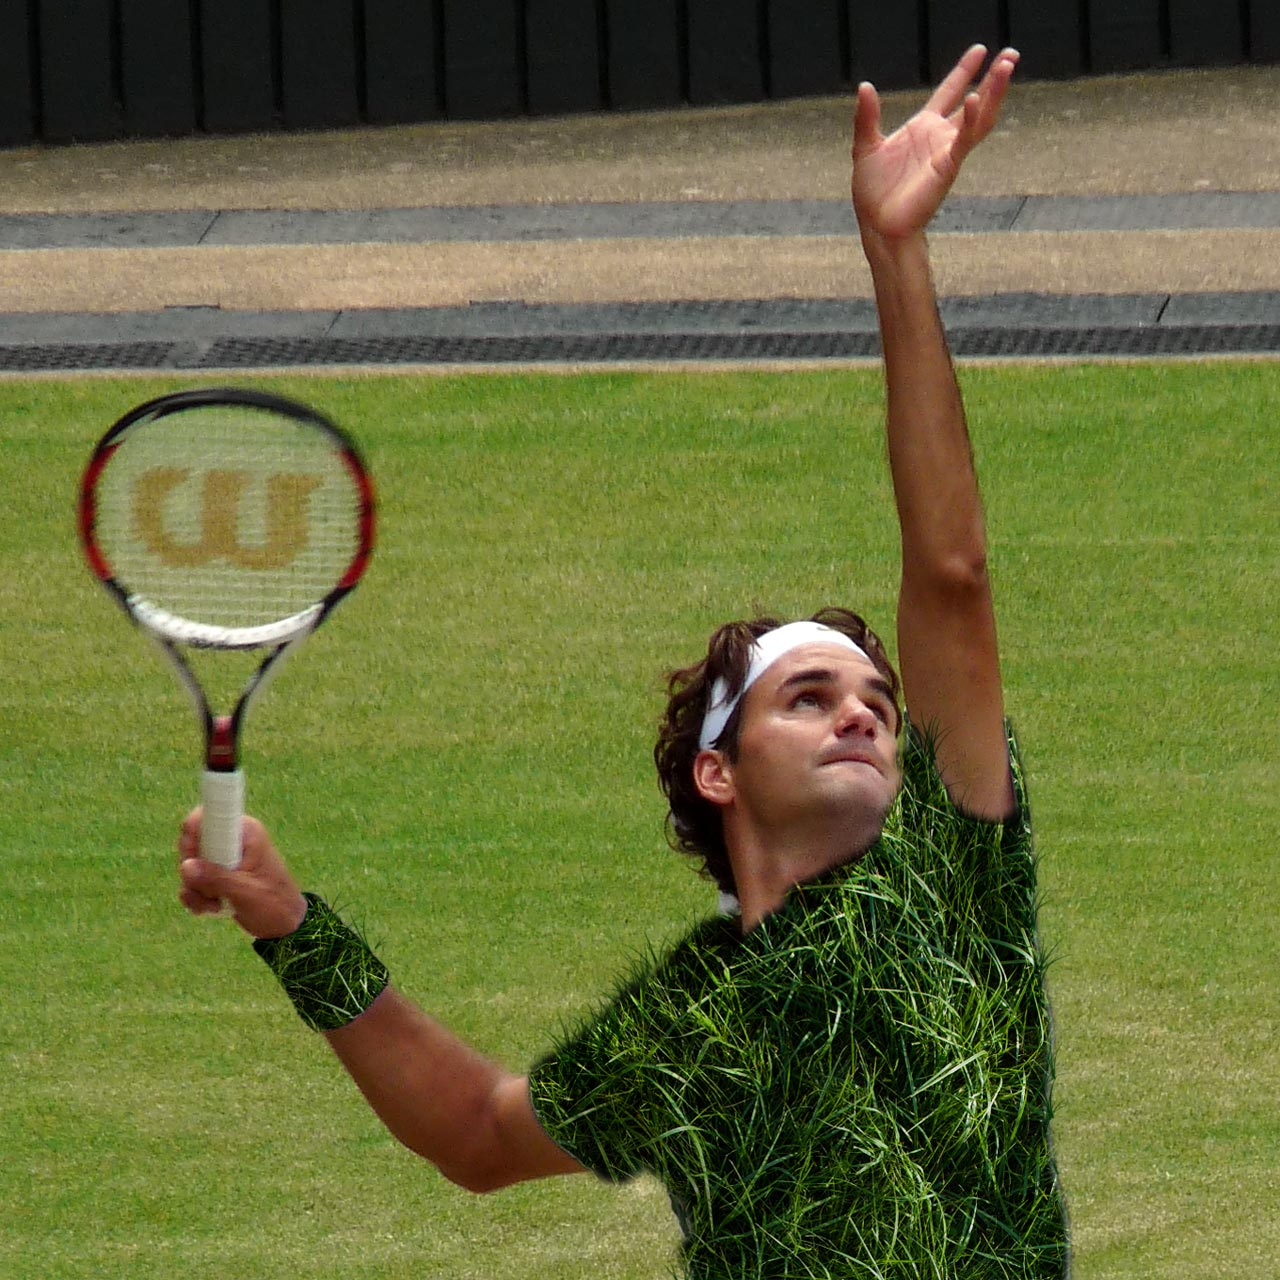 Roger Federer in grass attire.